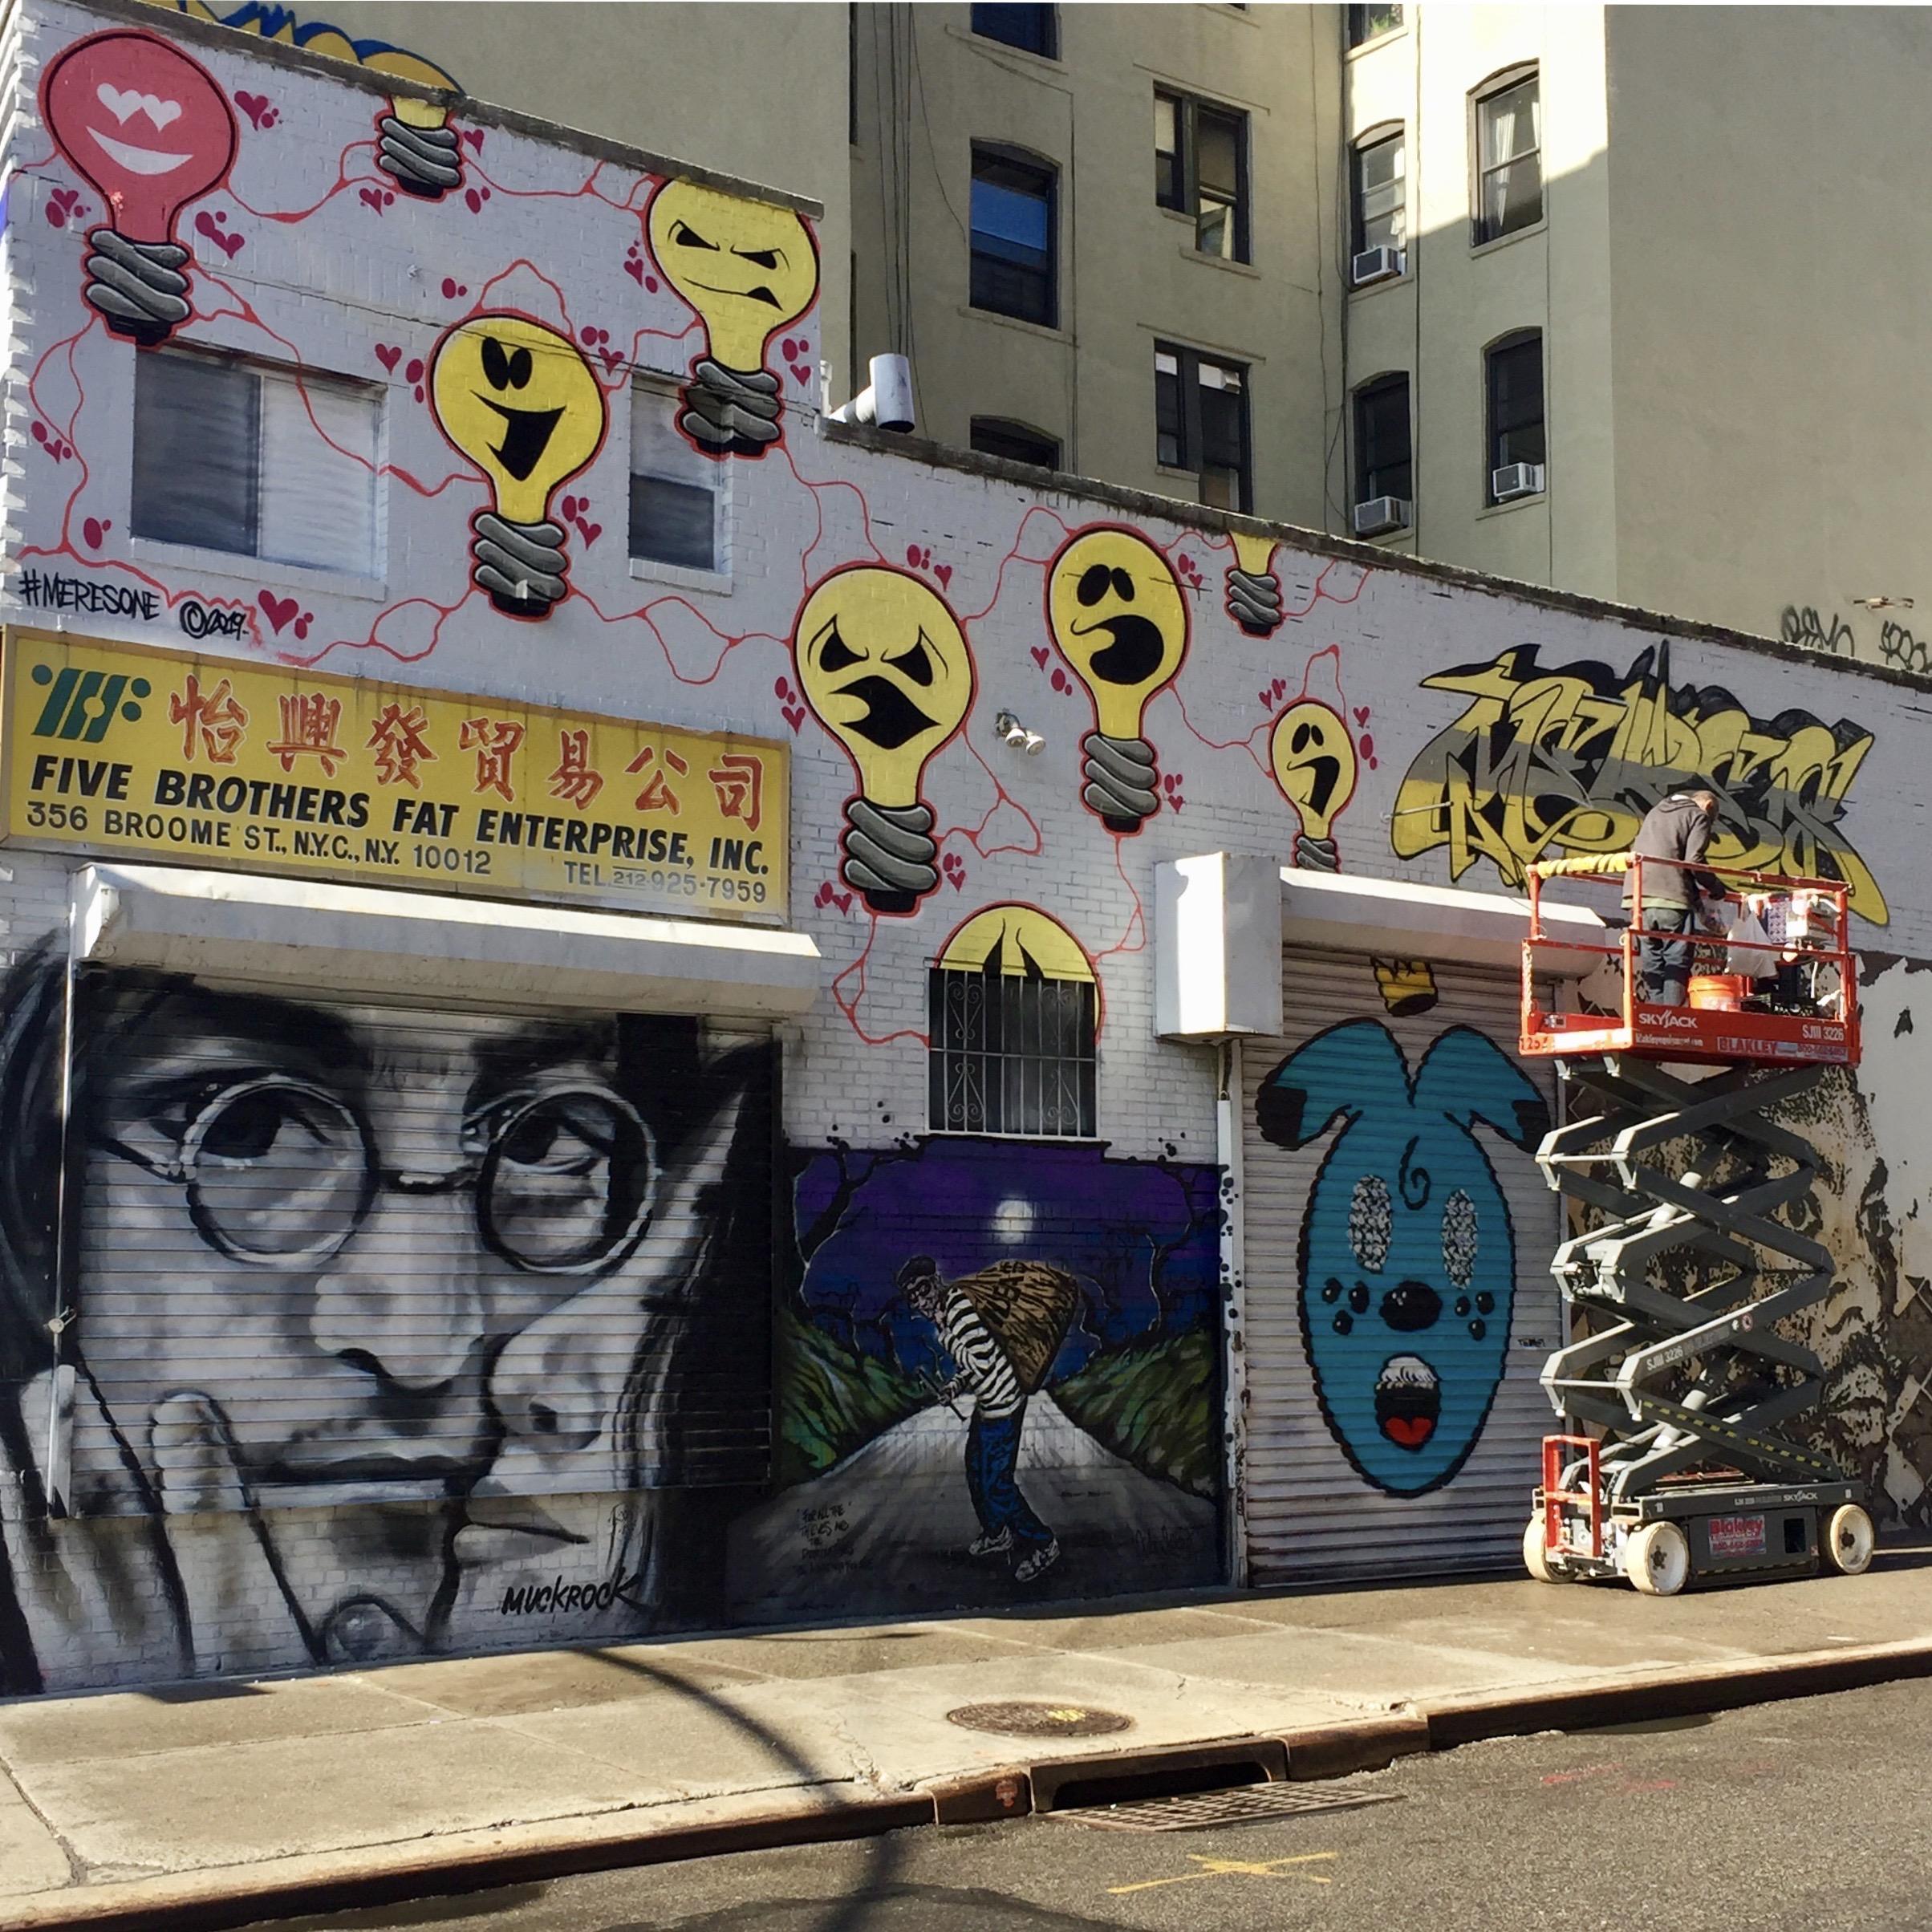 Meresone signe son oeuvre - Lisa Project - Little Italy - Street Art New York